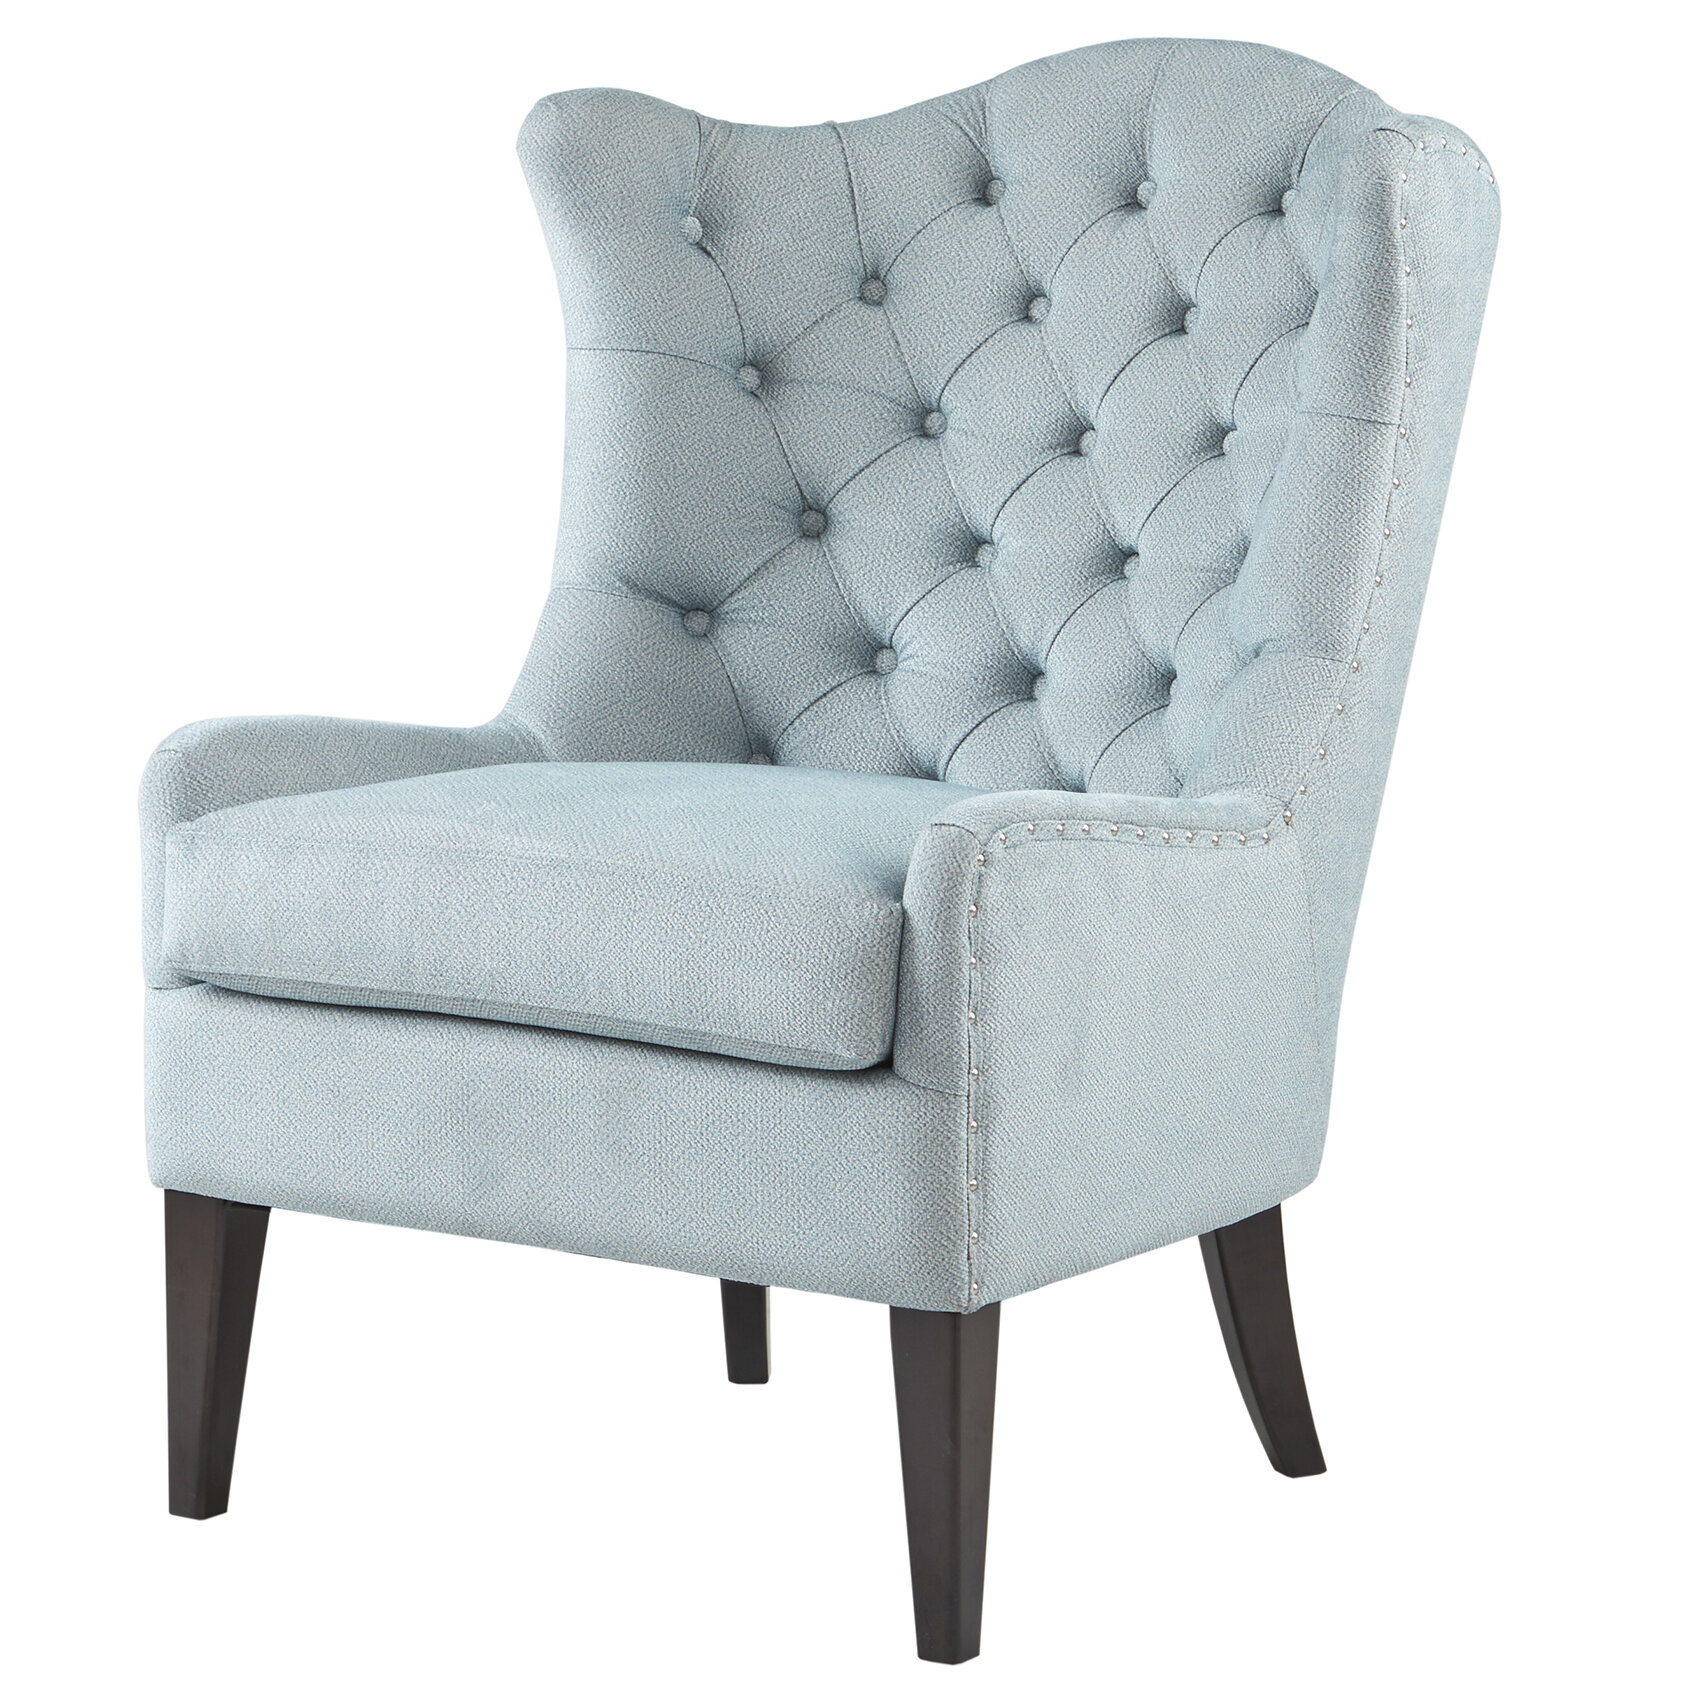 Alcott Hill Van Houzen Wingback Chair & Reviews | Wayfair